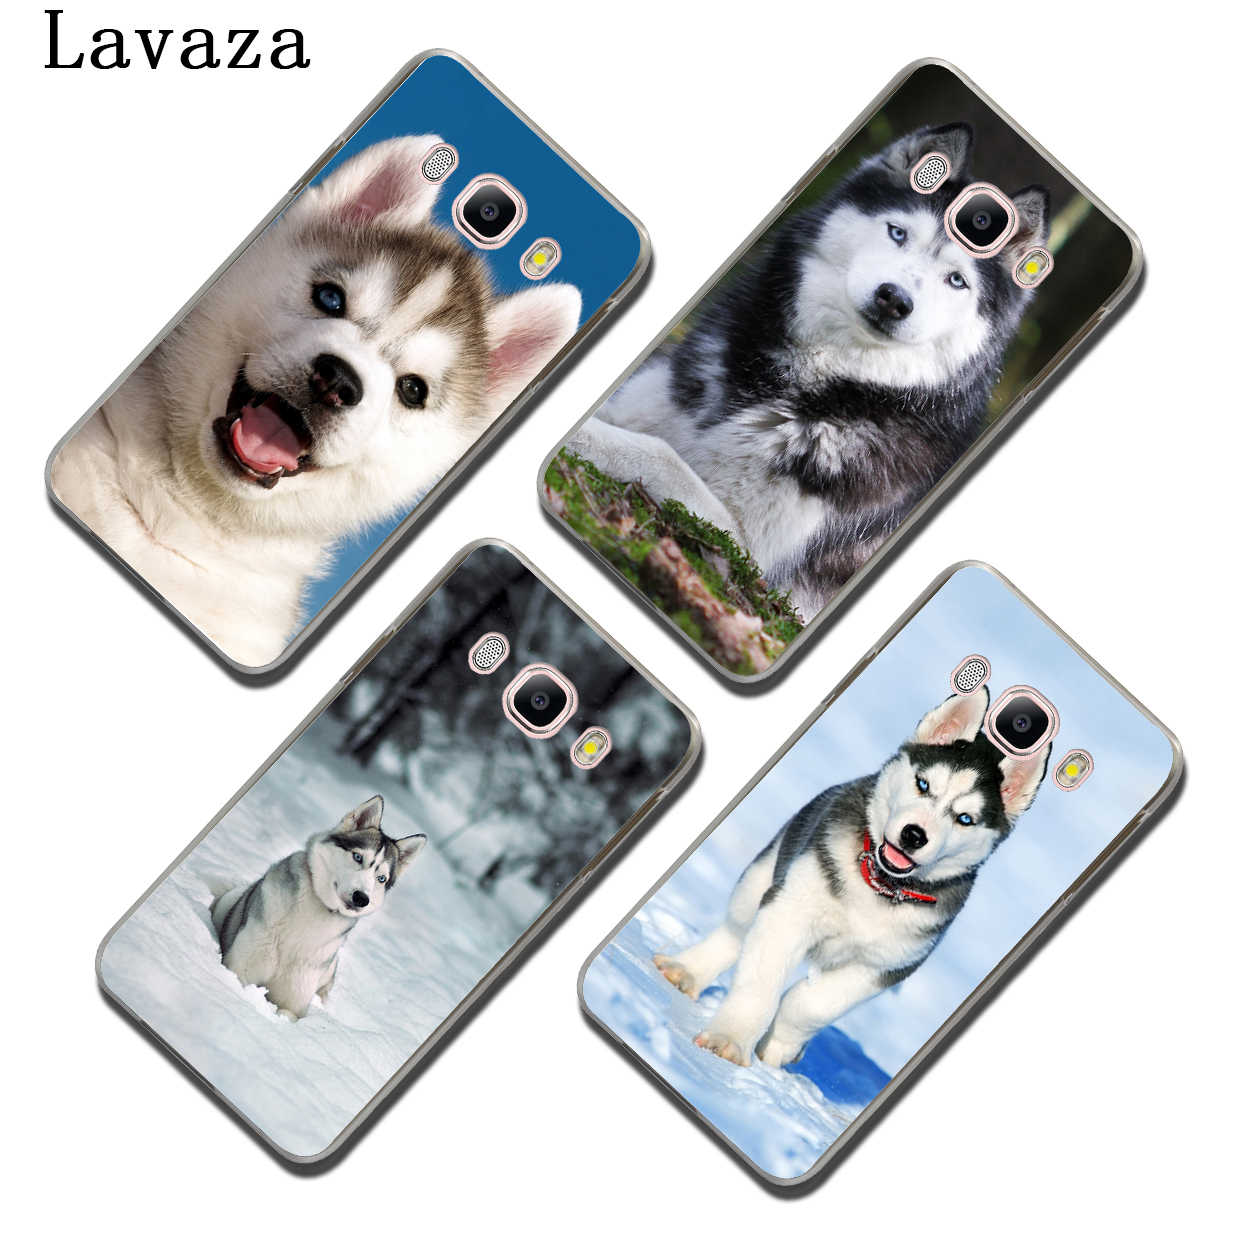 Lavaza щенок хаски, милая собачка, защитный чехол для телефона чехол для samsung Galaxy J7 J6 J5 J1 J2 J3 2017 2016 2015 премьер-J5 EU версия крышка